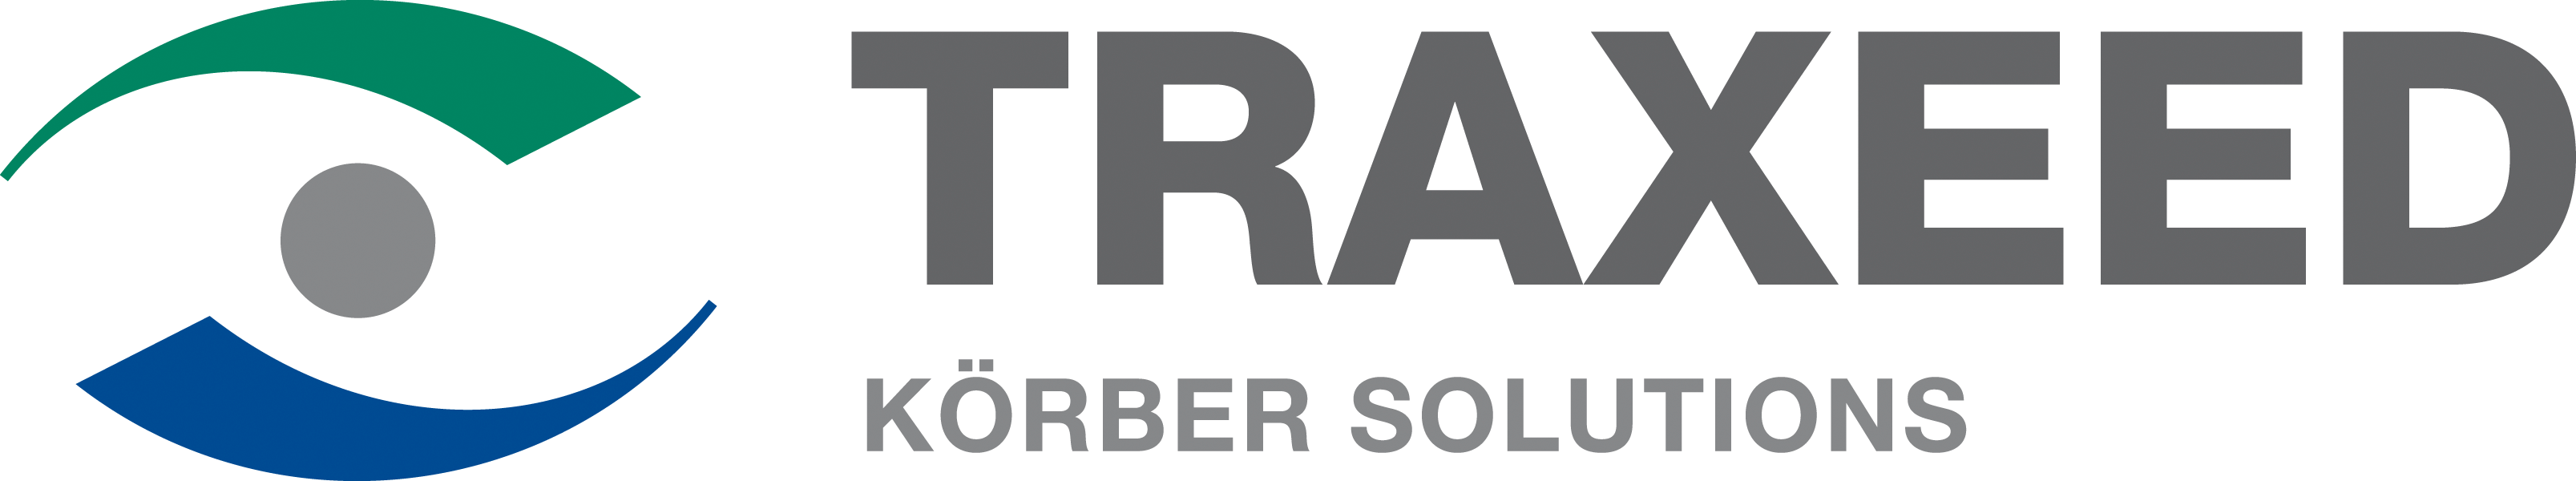 Traxeed Logo